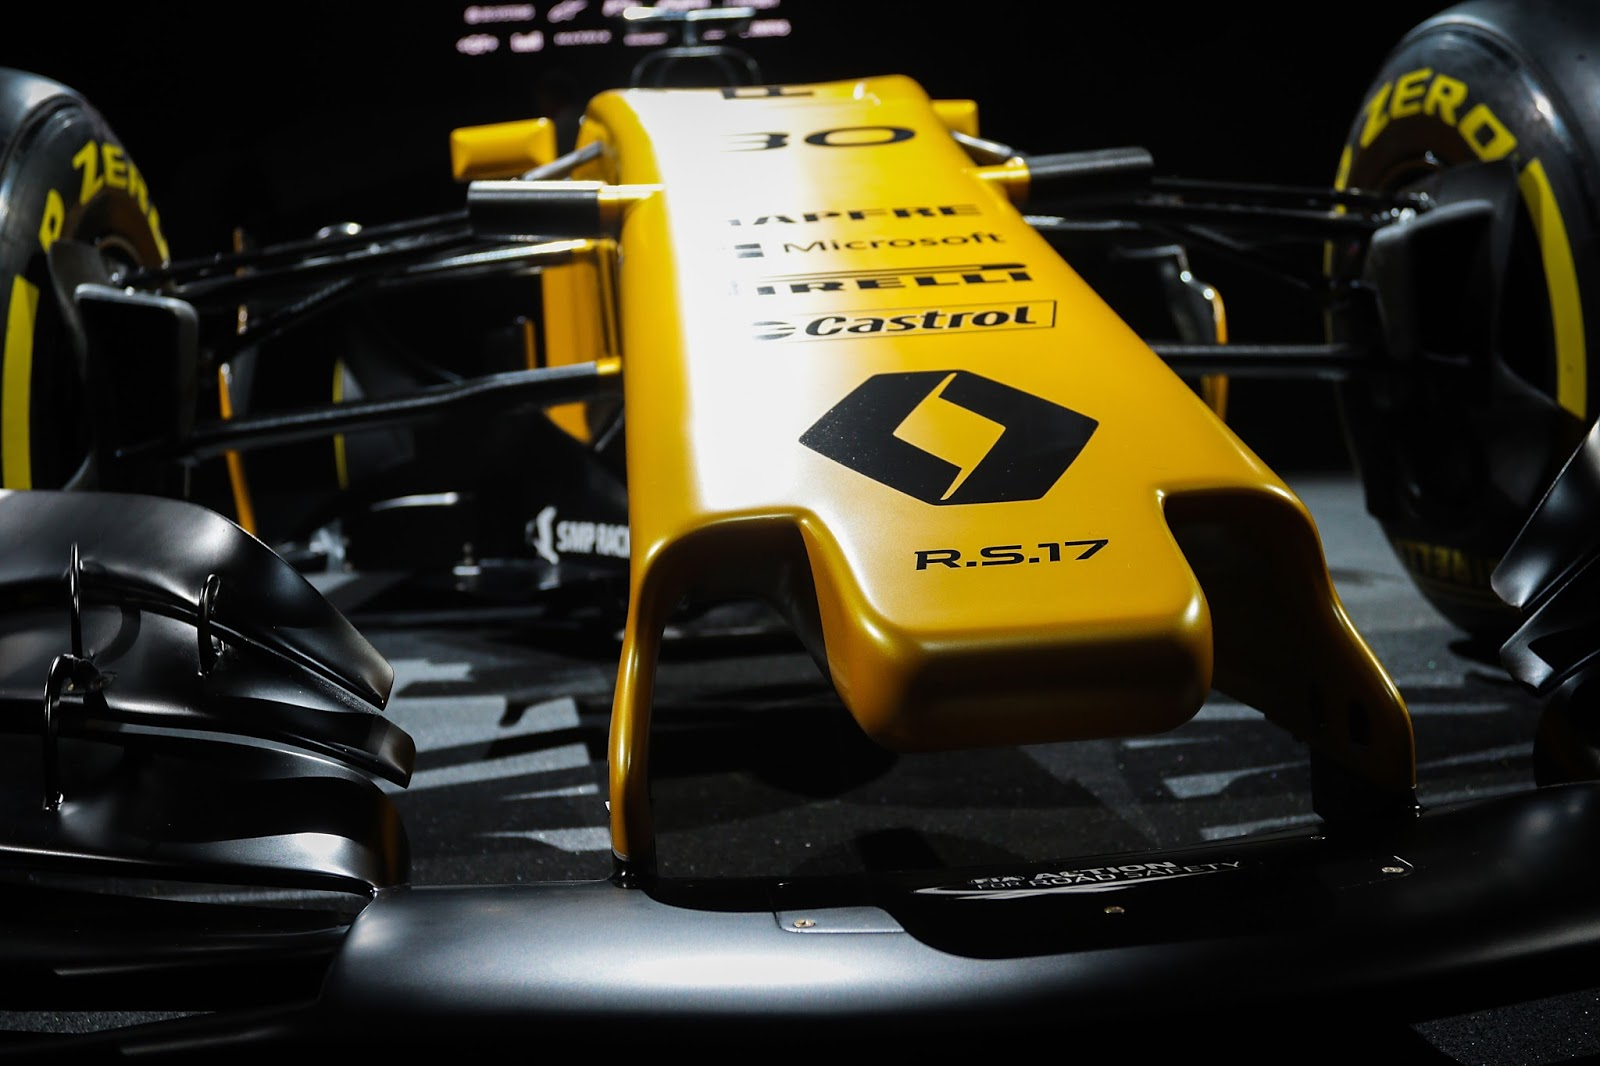 20170221153343 272d4793 Η Renault Sport παρουσίασε το καινούργιο της μονοθέσιο, την R.S.17 F1, Formula 1, Renault, Renault Sport Formula 1 Team, videos